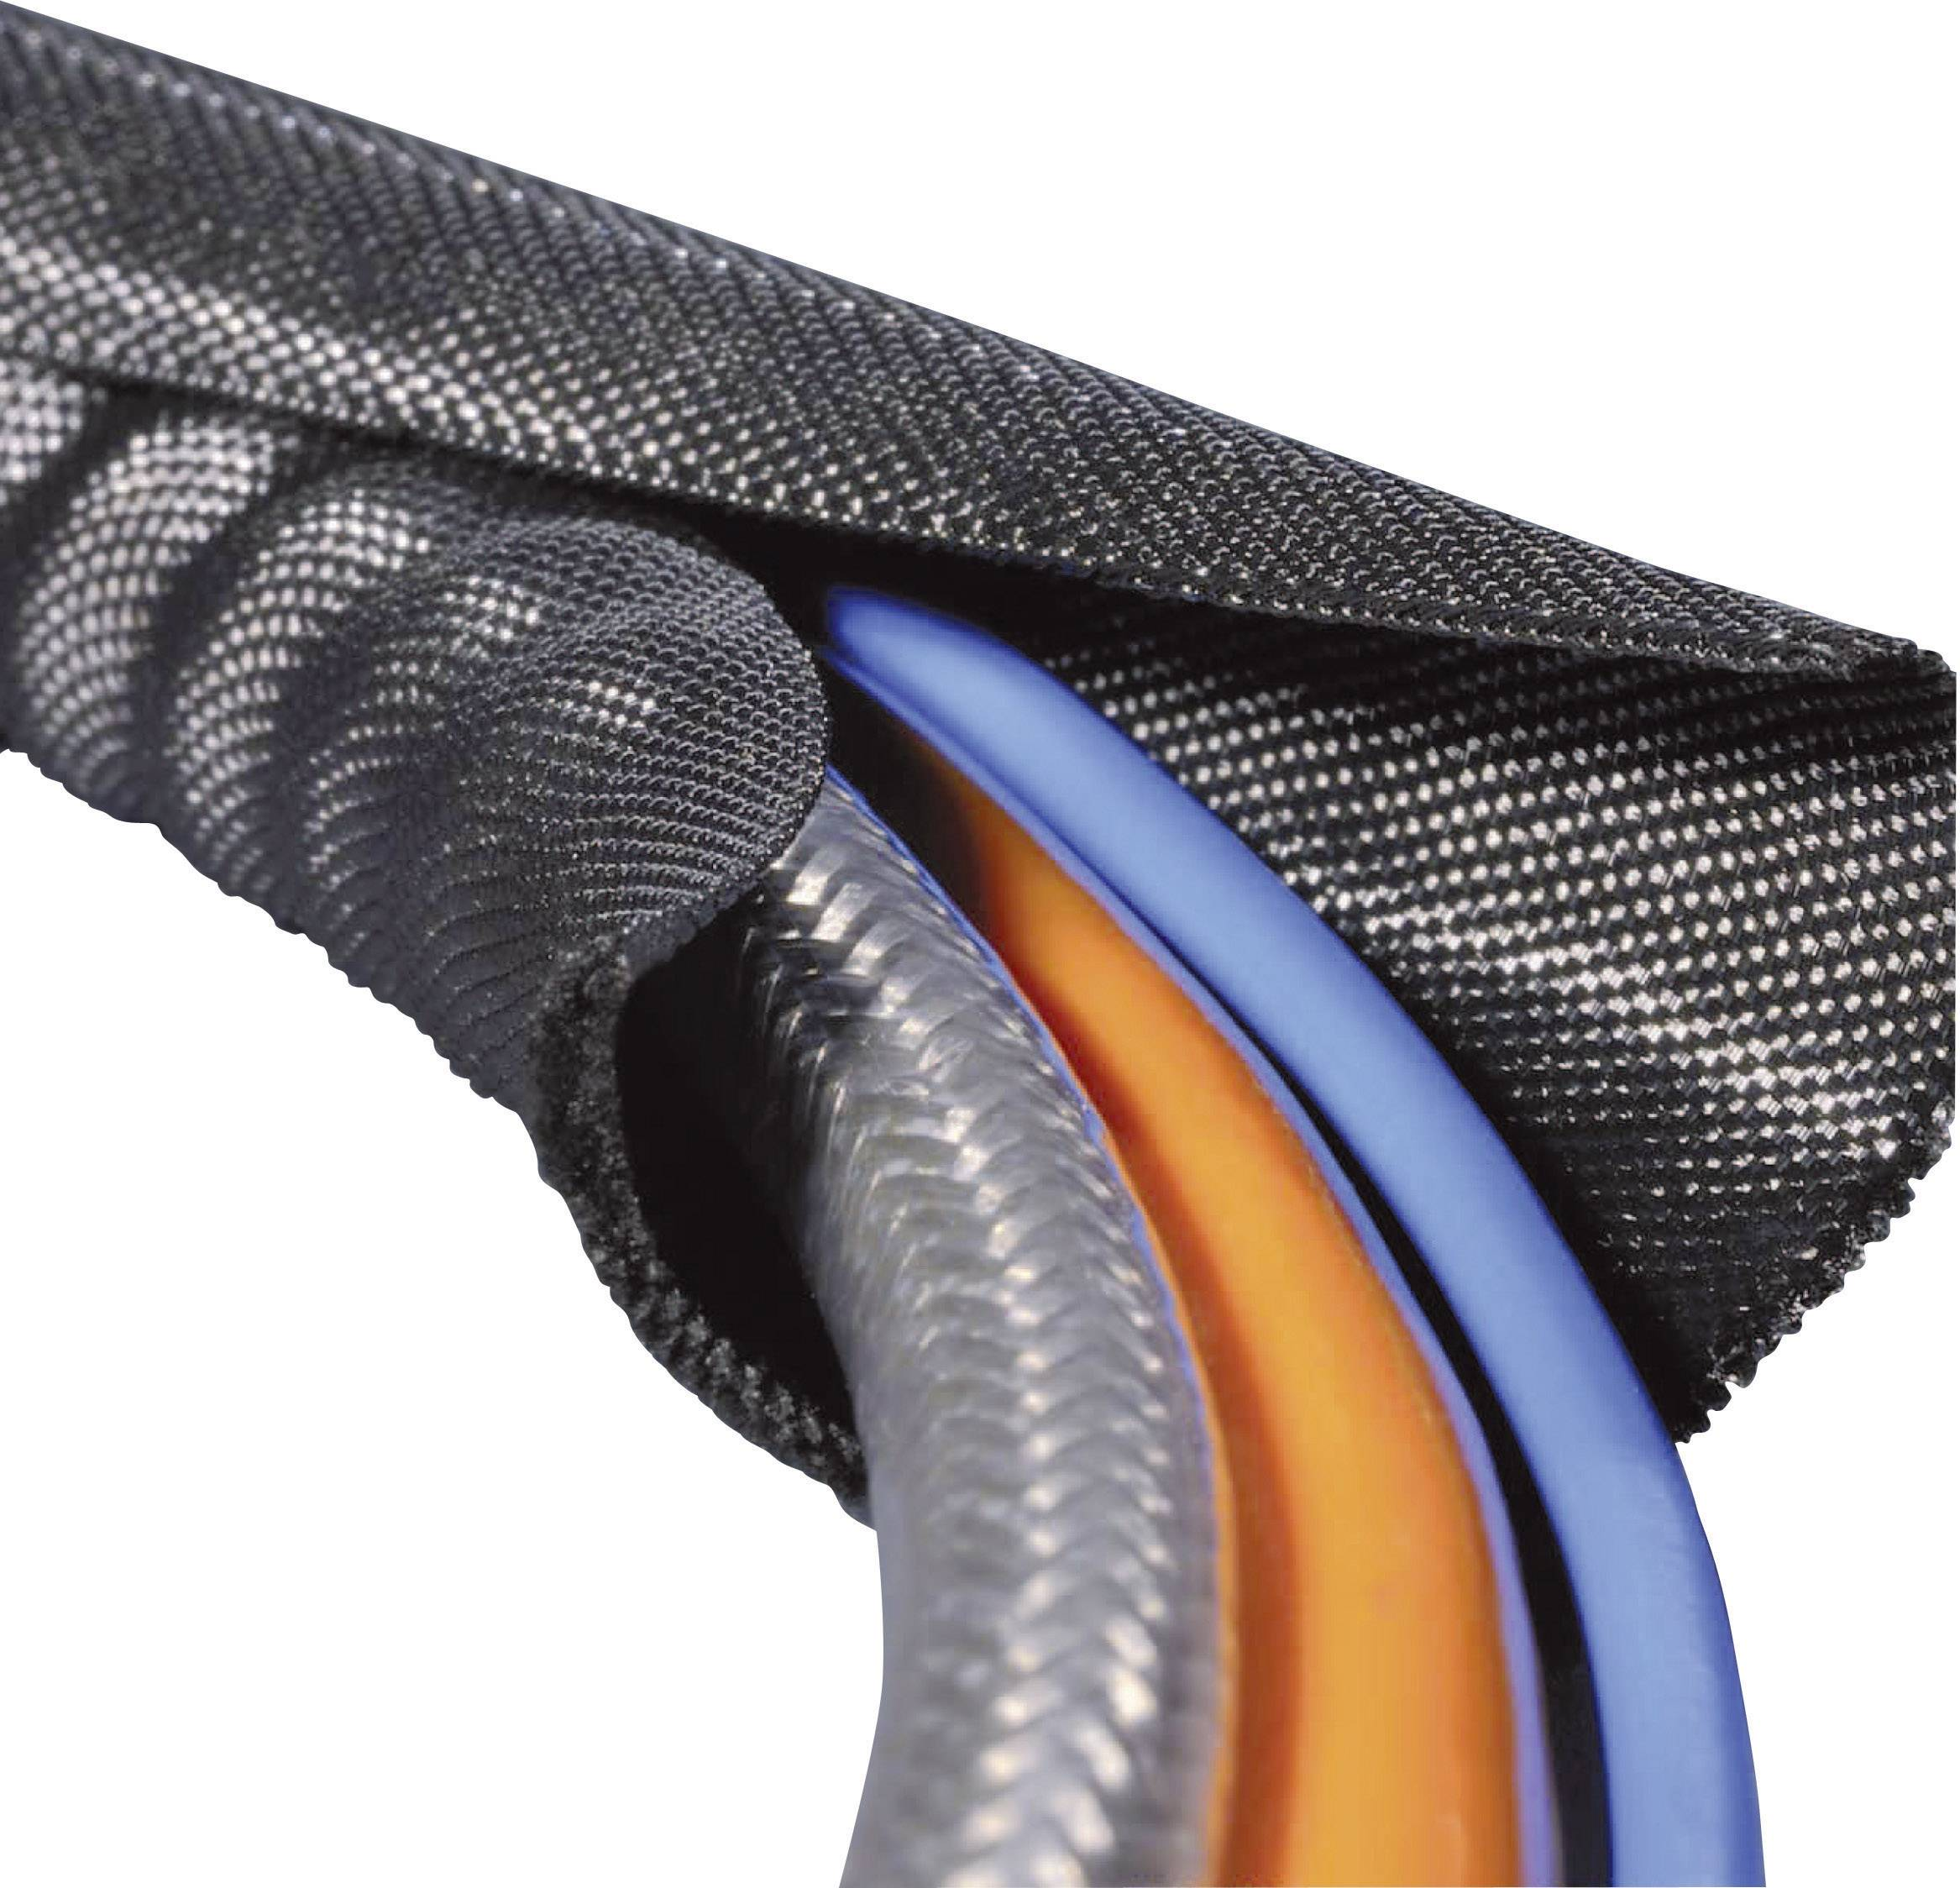 Ochranný oplet HellermannTyton Twist-In 32 (170-01007), 32 mm, černá